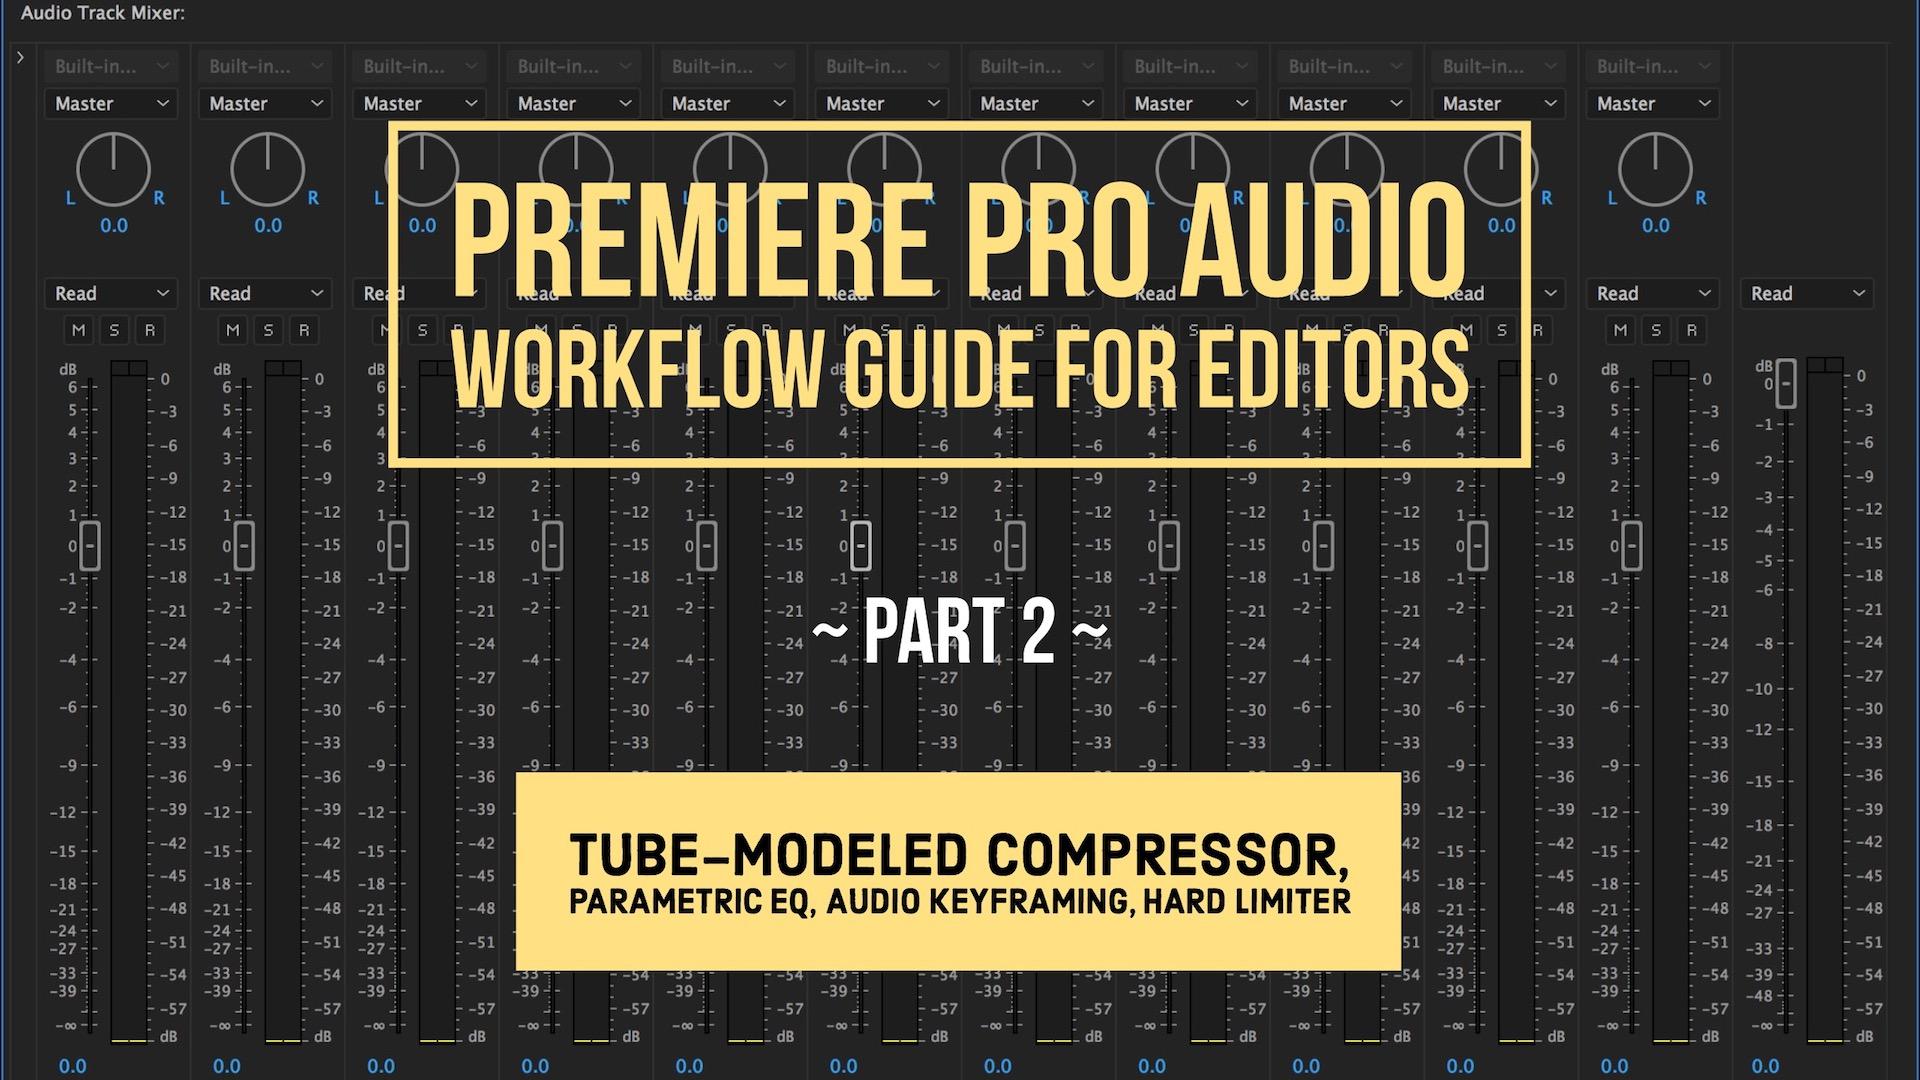 premiere-pro-audio-workflow-guide-for-editors-part-2.jpg